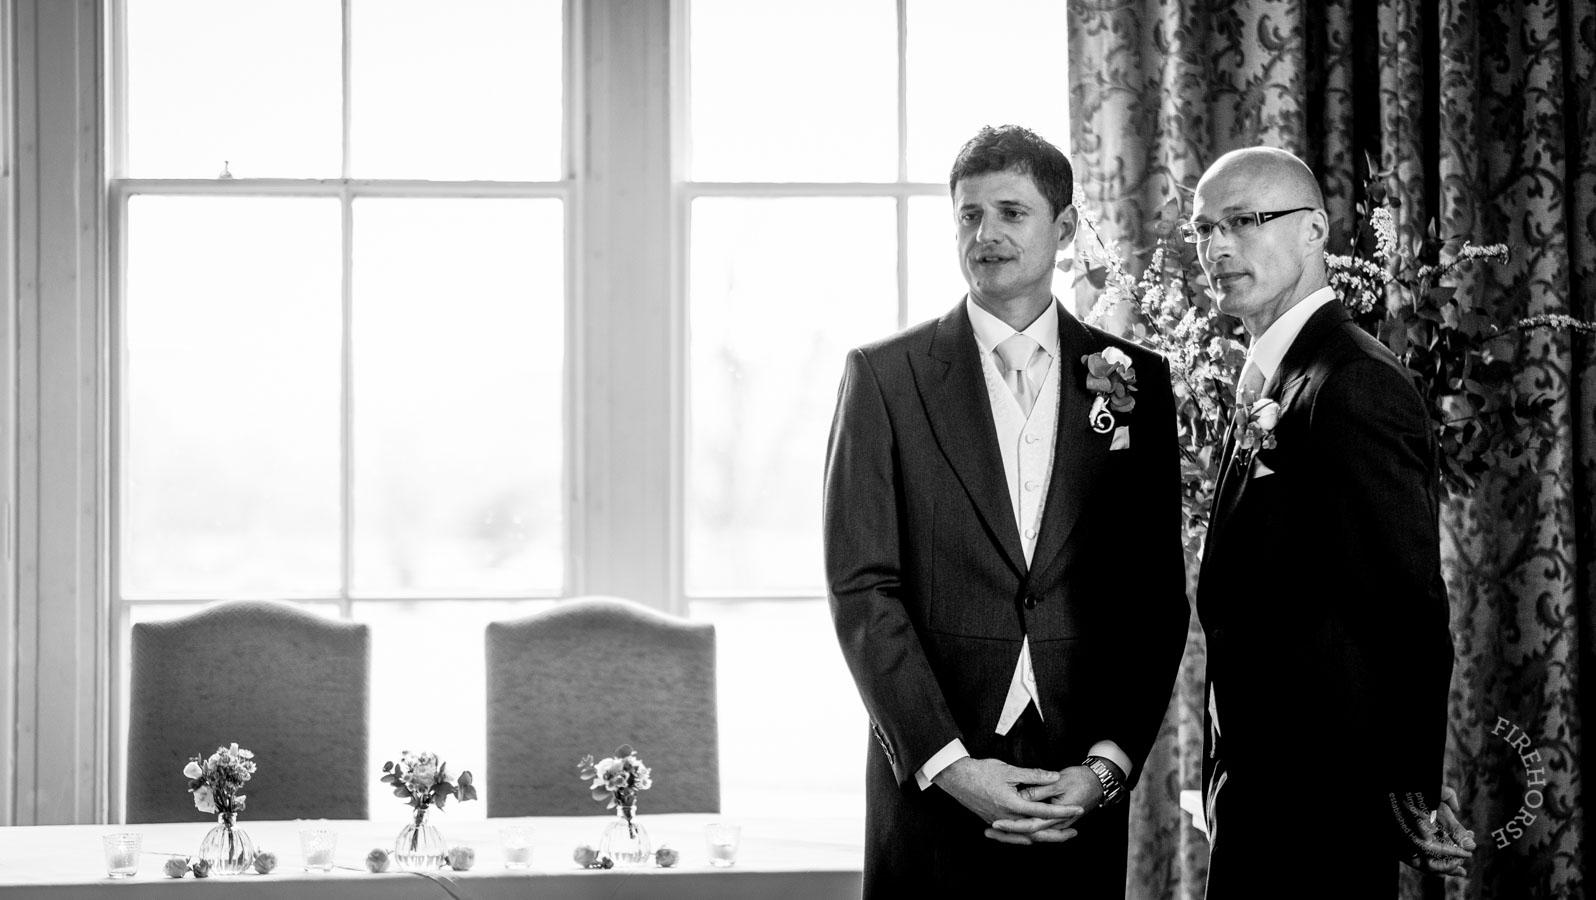 Swinton-Park-Spring-Wedding-192